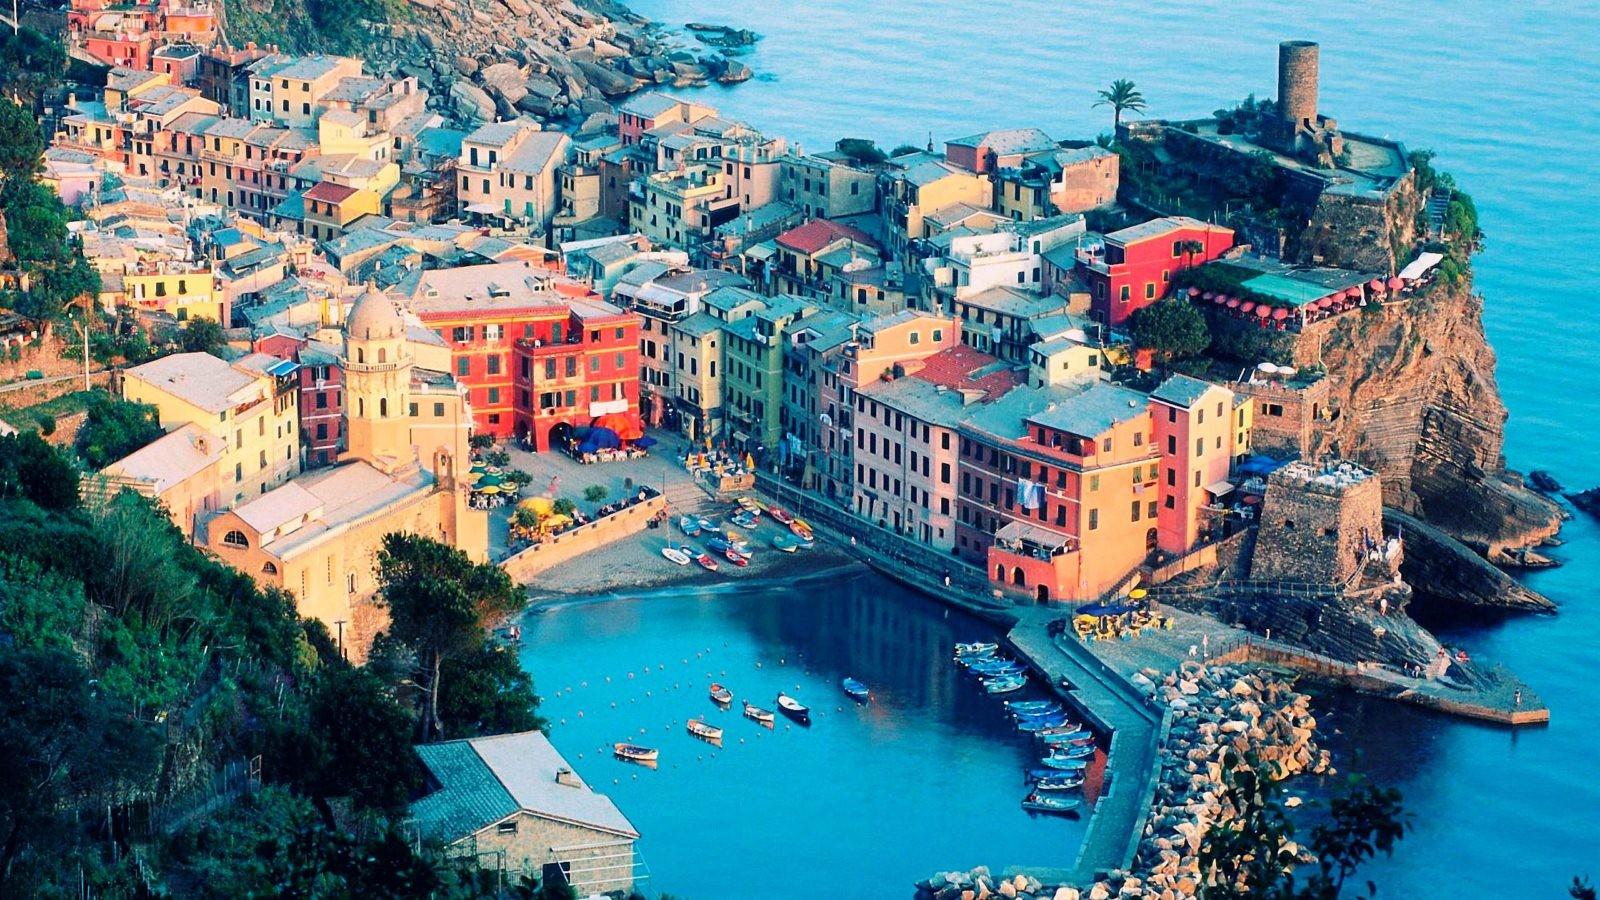 Vernazza Mac Travel Italy Wallpaper Hd Like Wallpapers 1600x900